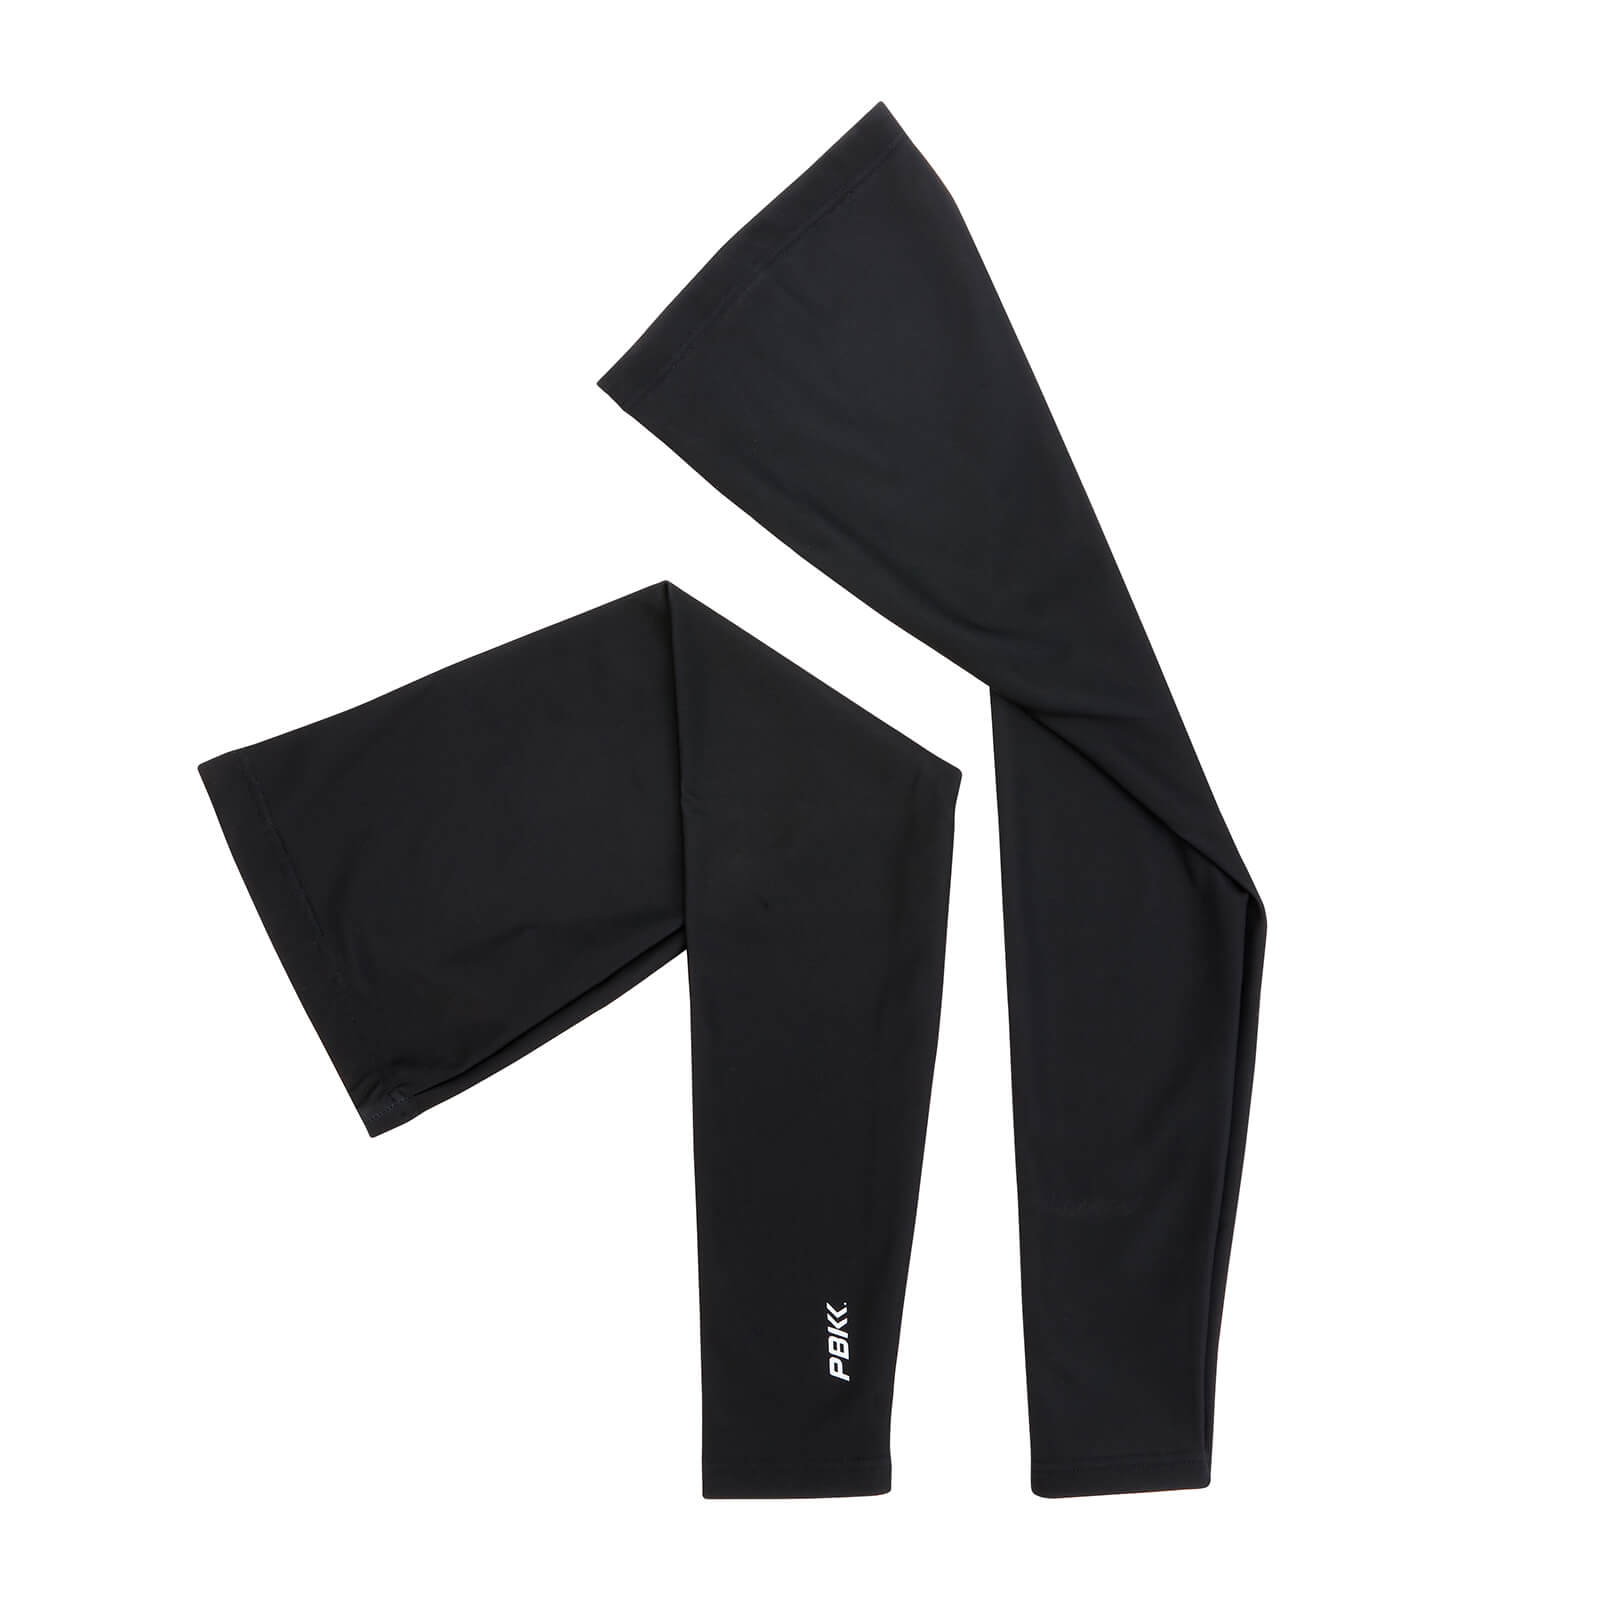 Santini Redux Fortuna Skin Suit - Xl - Vineyard